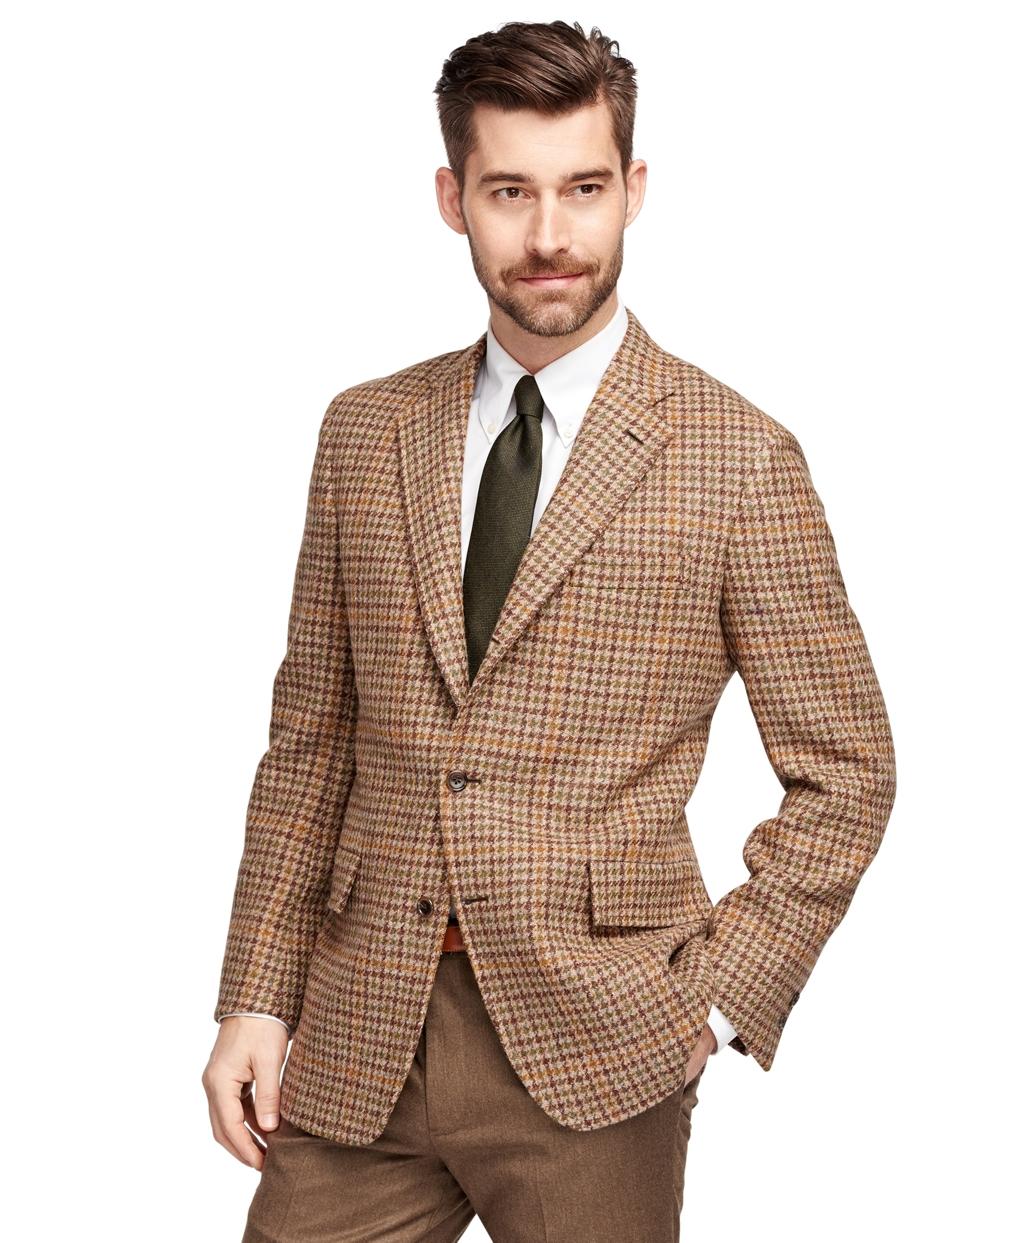 Brooks Brothers Own Make Harris Tweed Check Sport Coat In